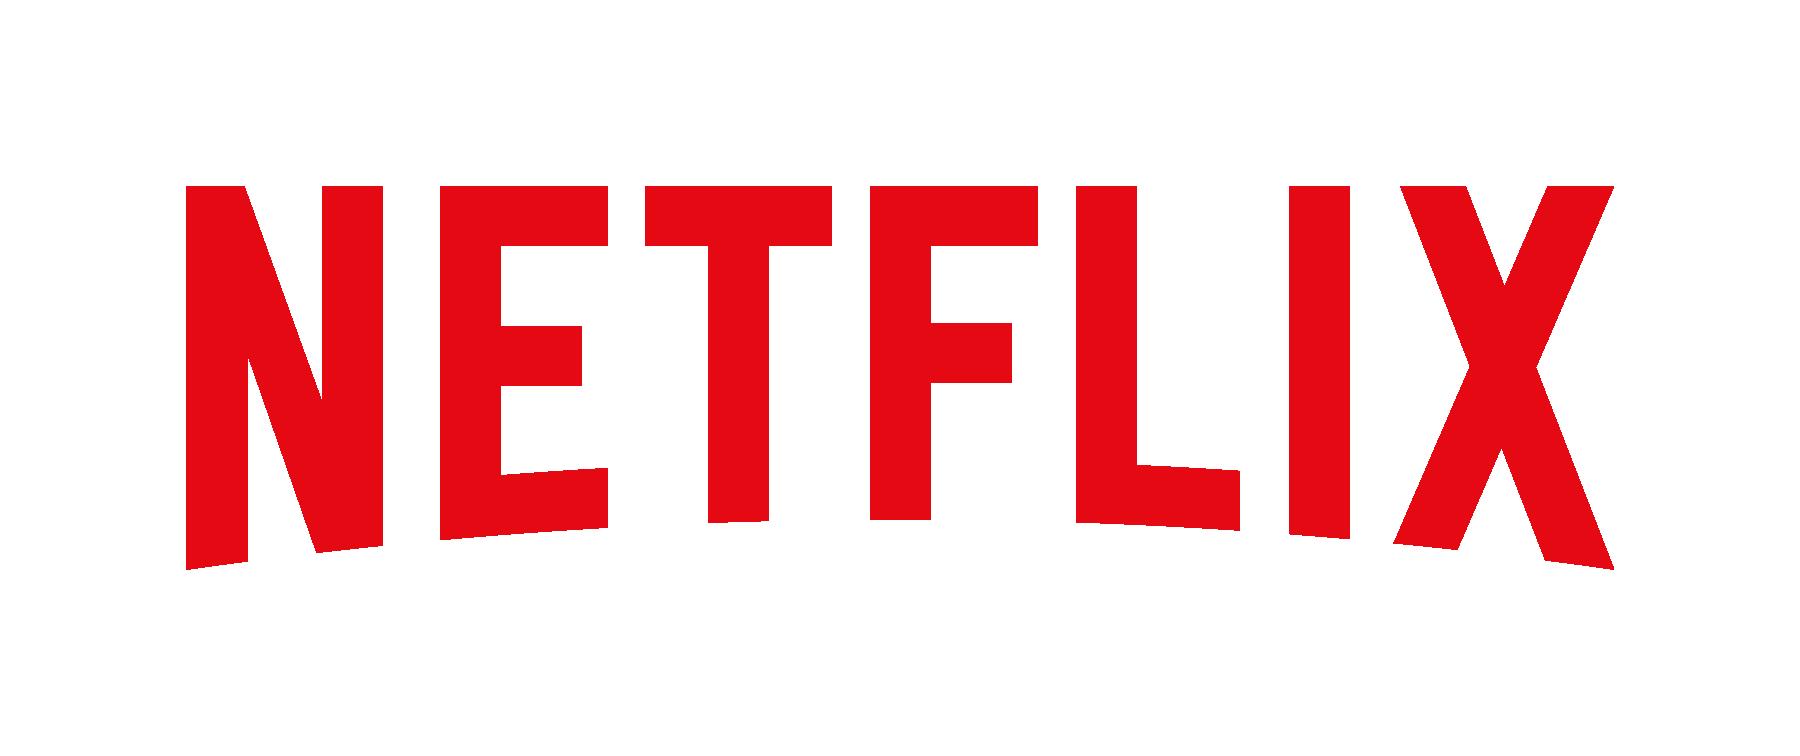 Podcasts auf Netflix?